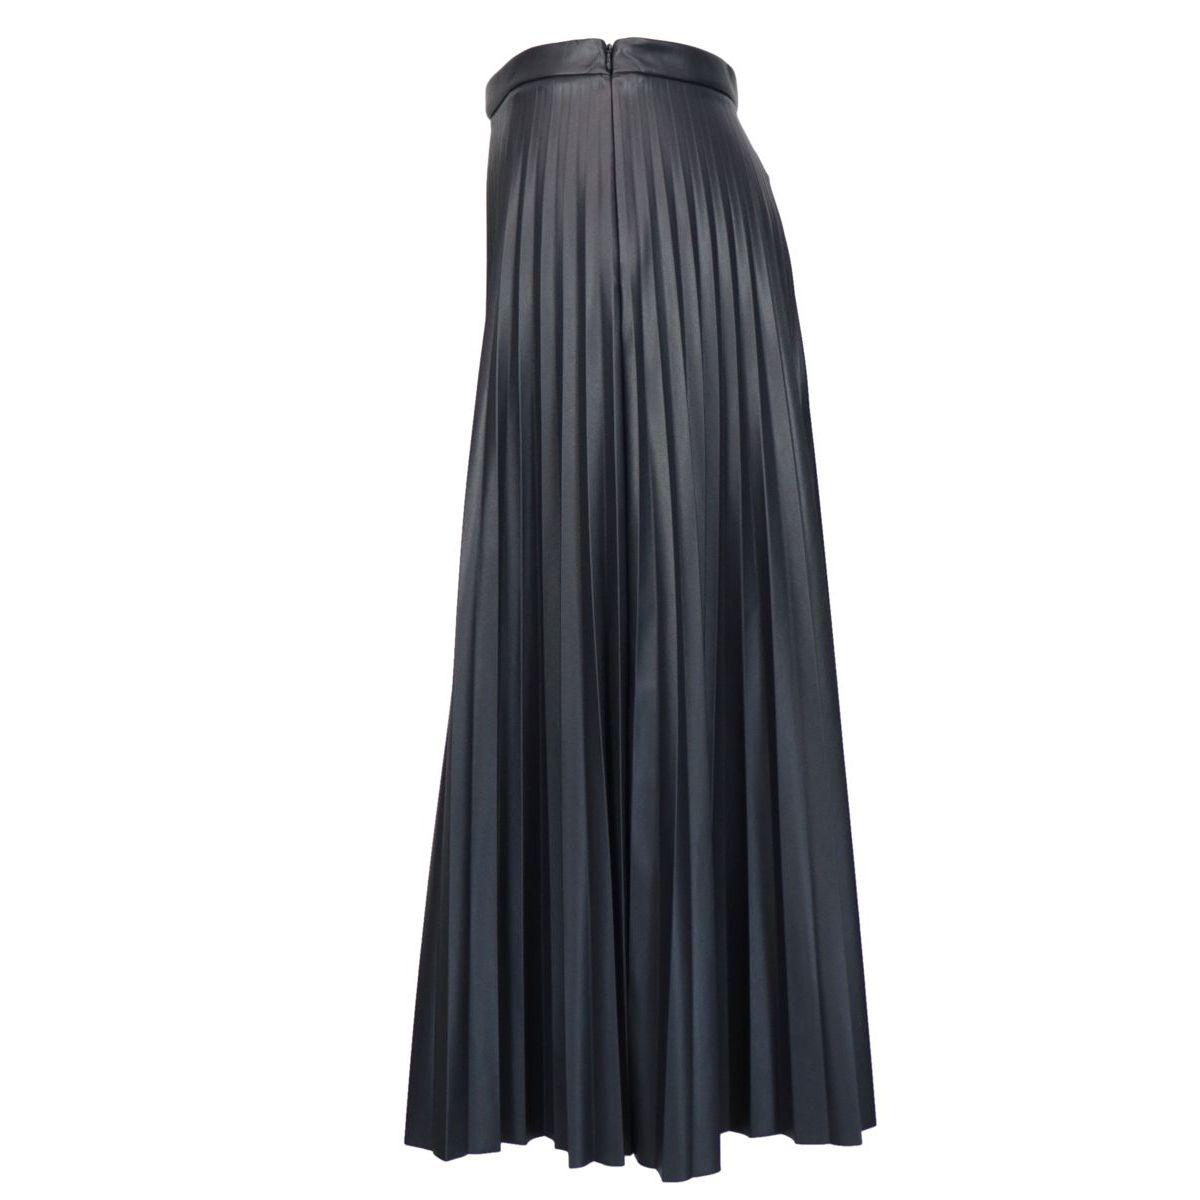 Dula skirt Black MAX MARA STUDIO